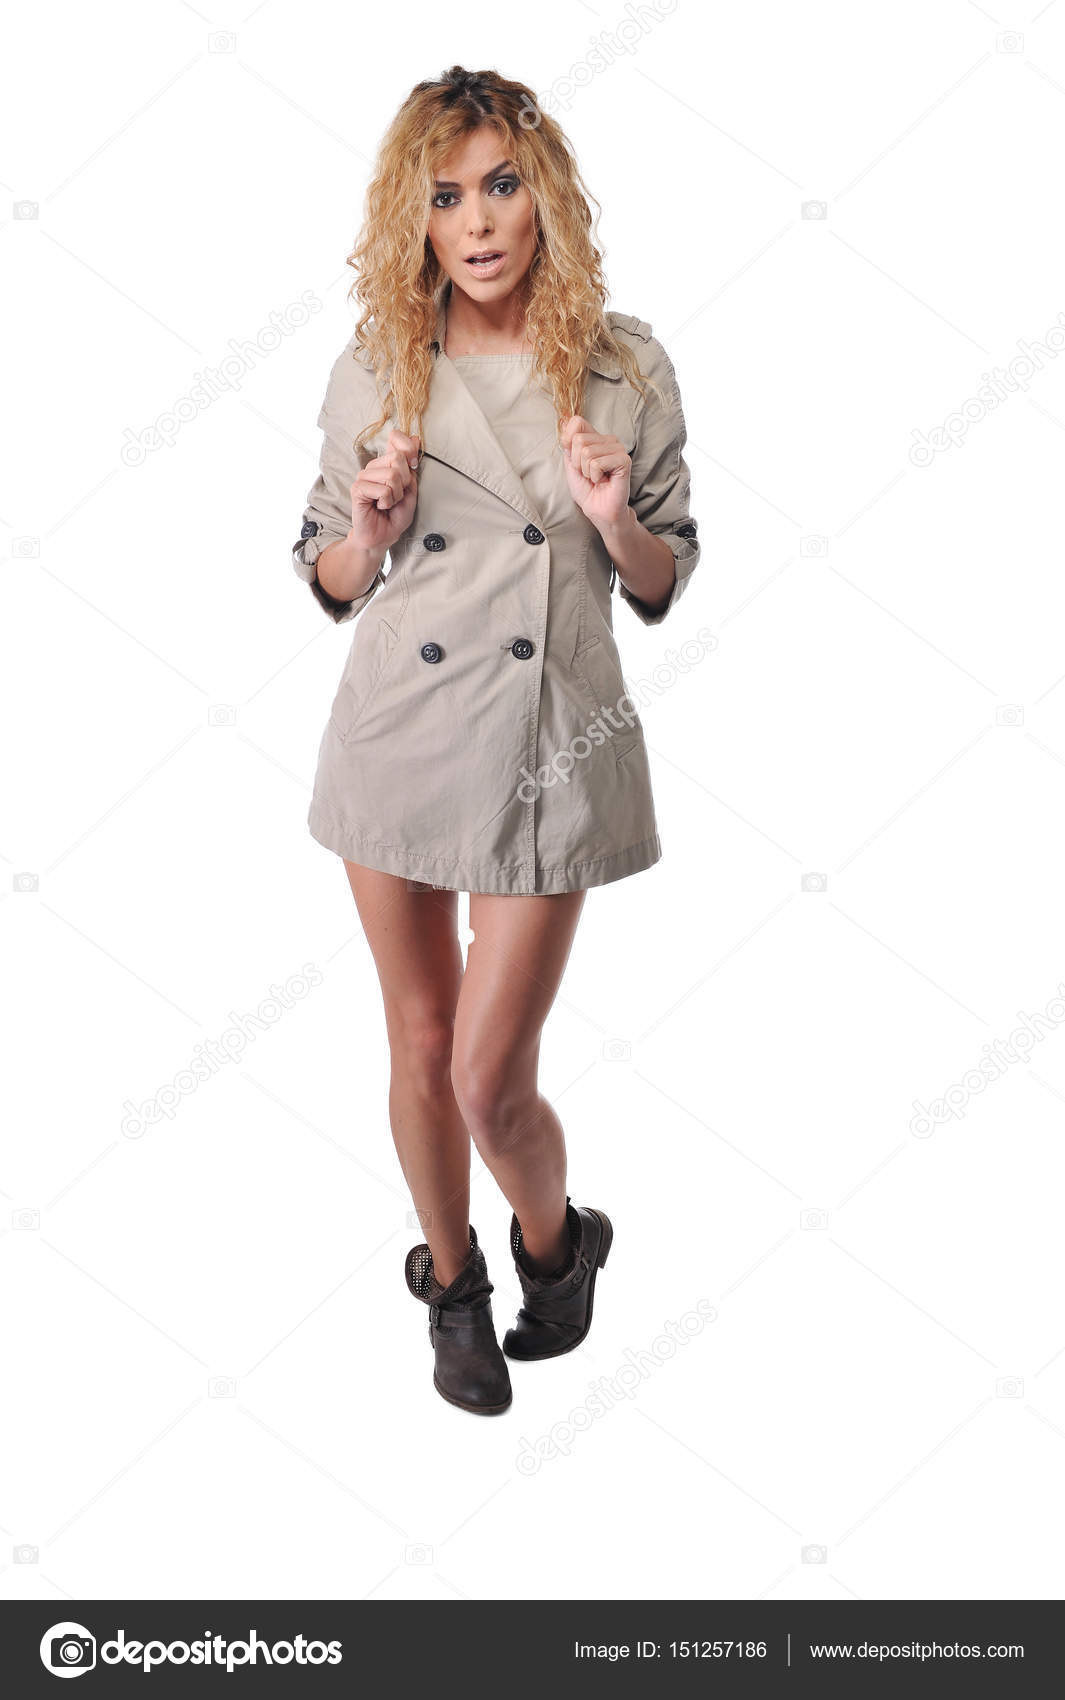 Imagen de una mujer bien vestida